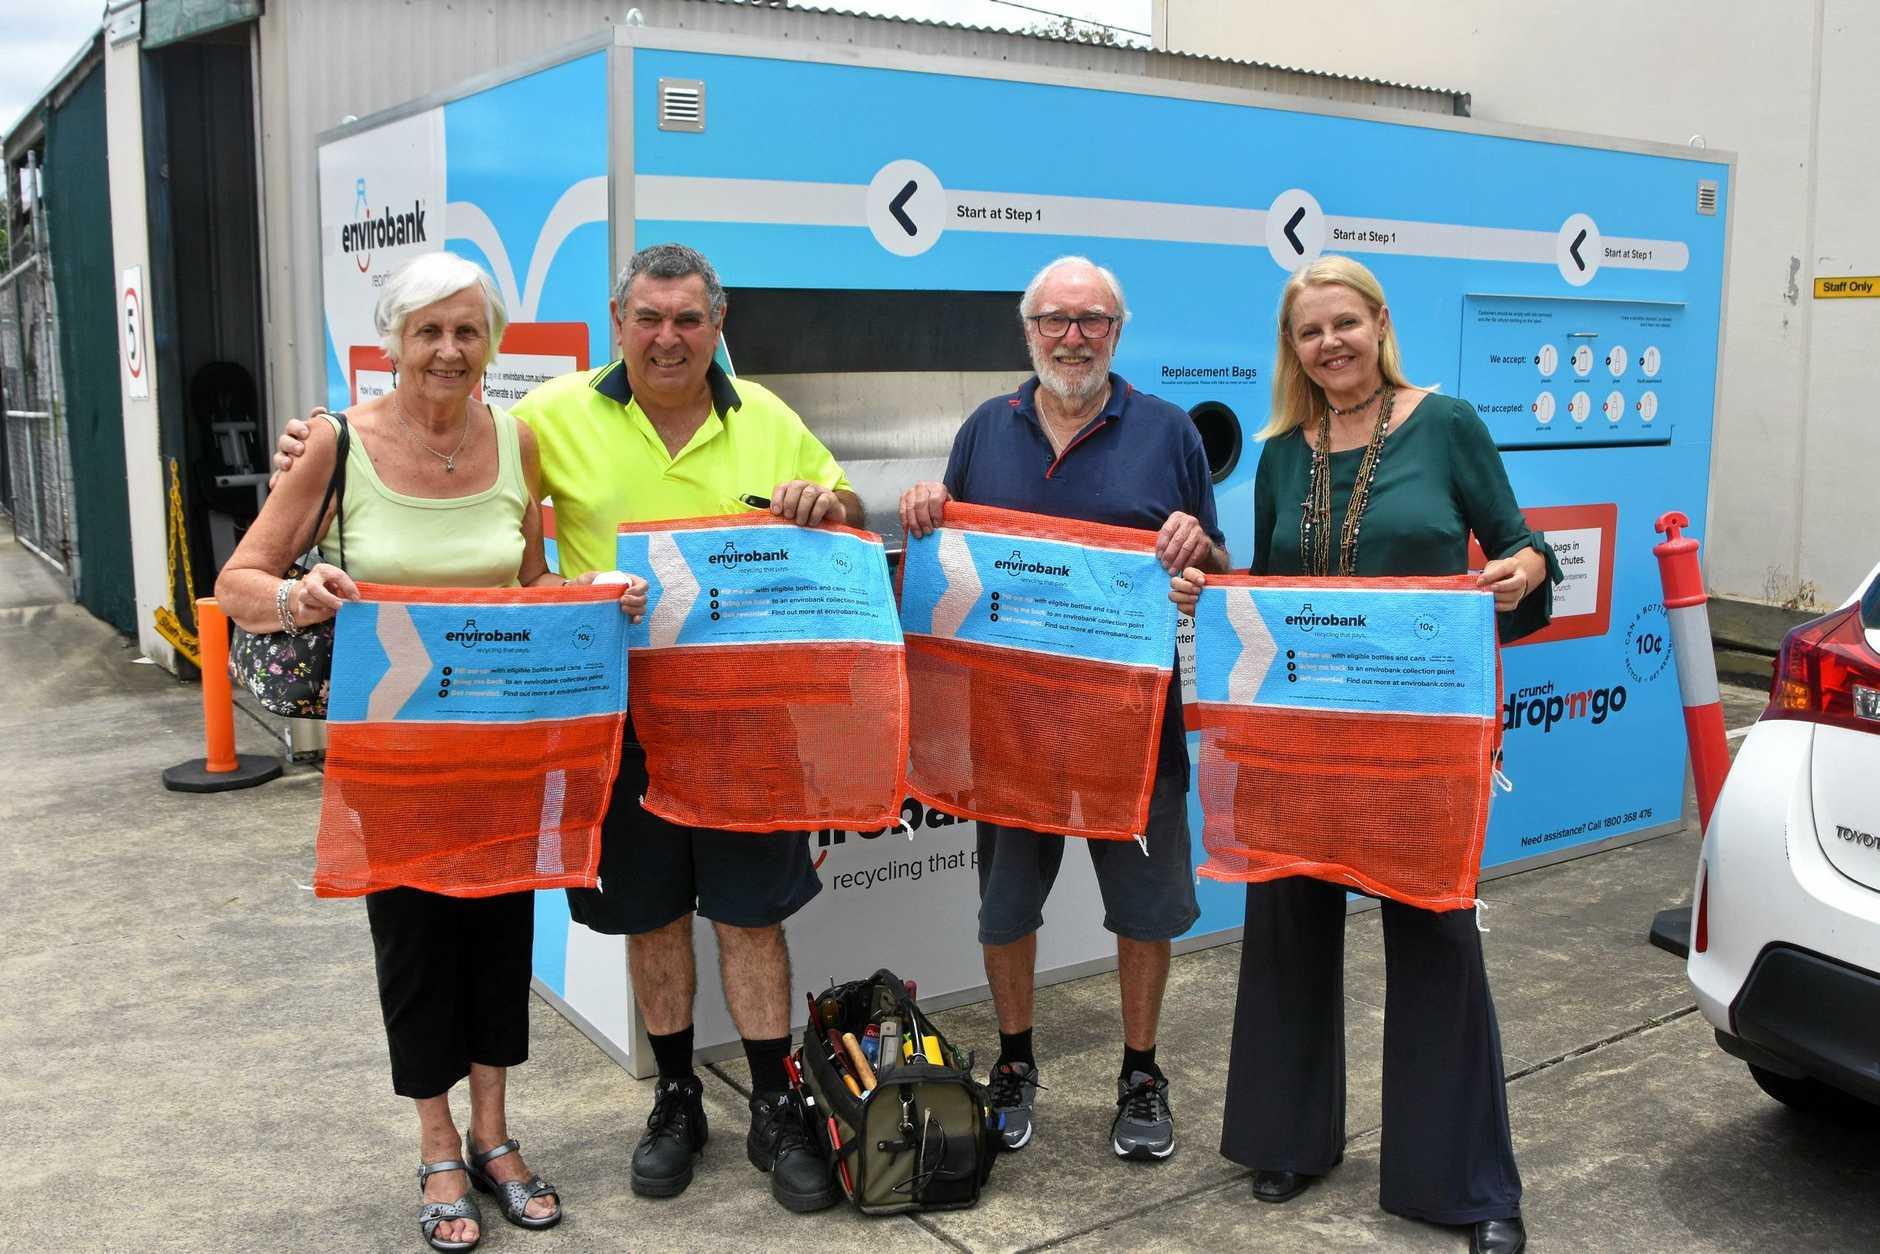 Teresa Stephenson, Vince D'Abarco, Bob Stephenson and Noosa MP Sandy Bolton with reusable Envirobank bags at Waves of Kindness, Noosaville.